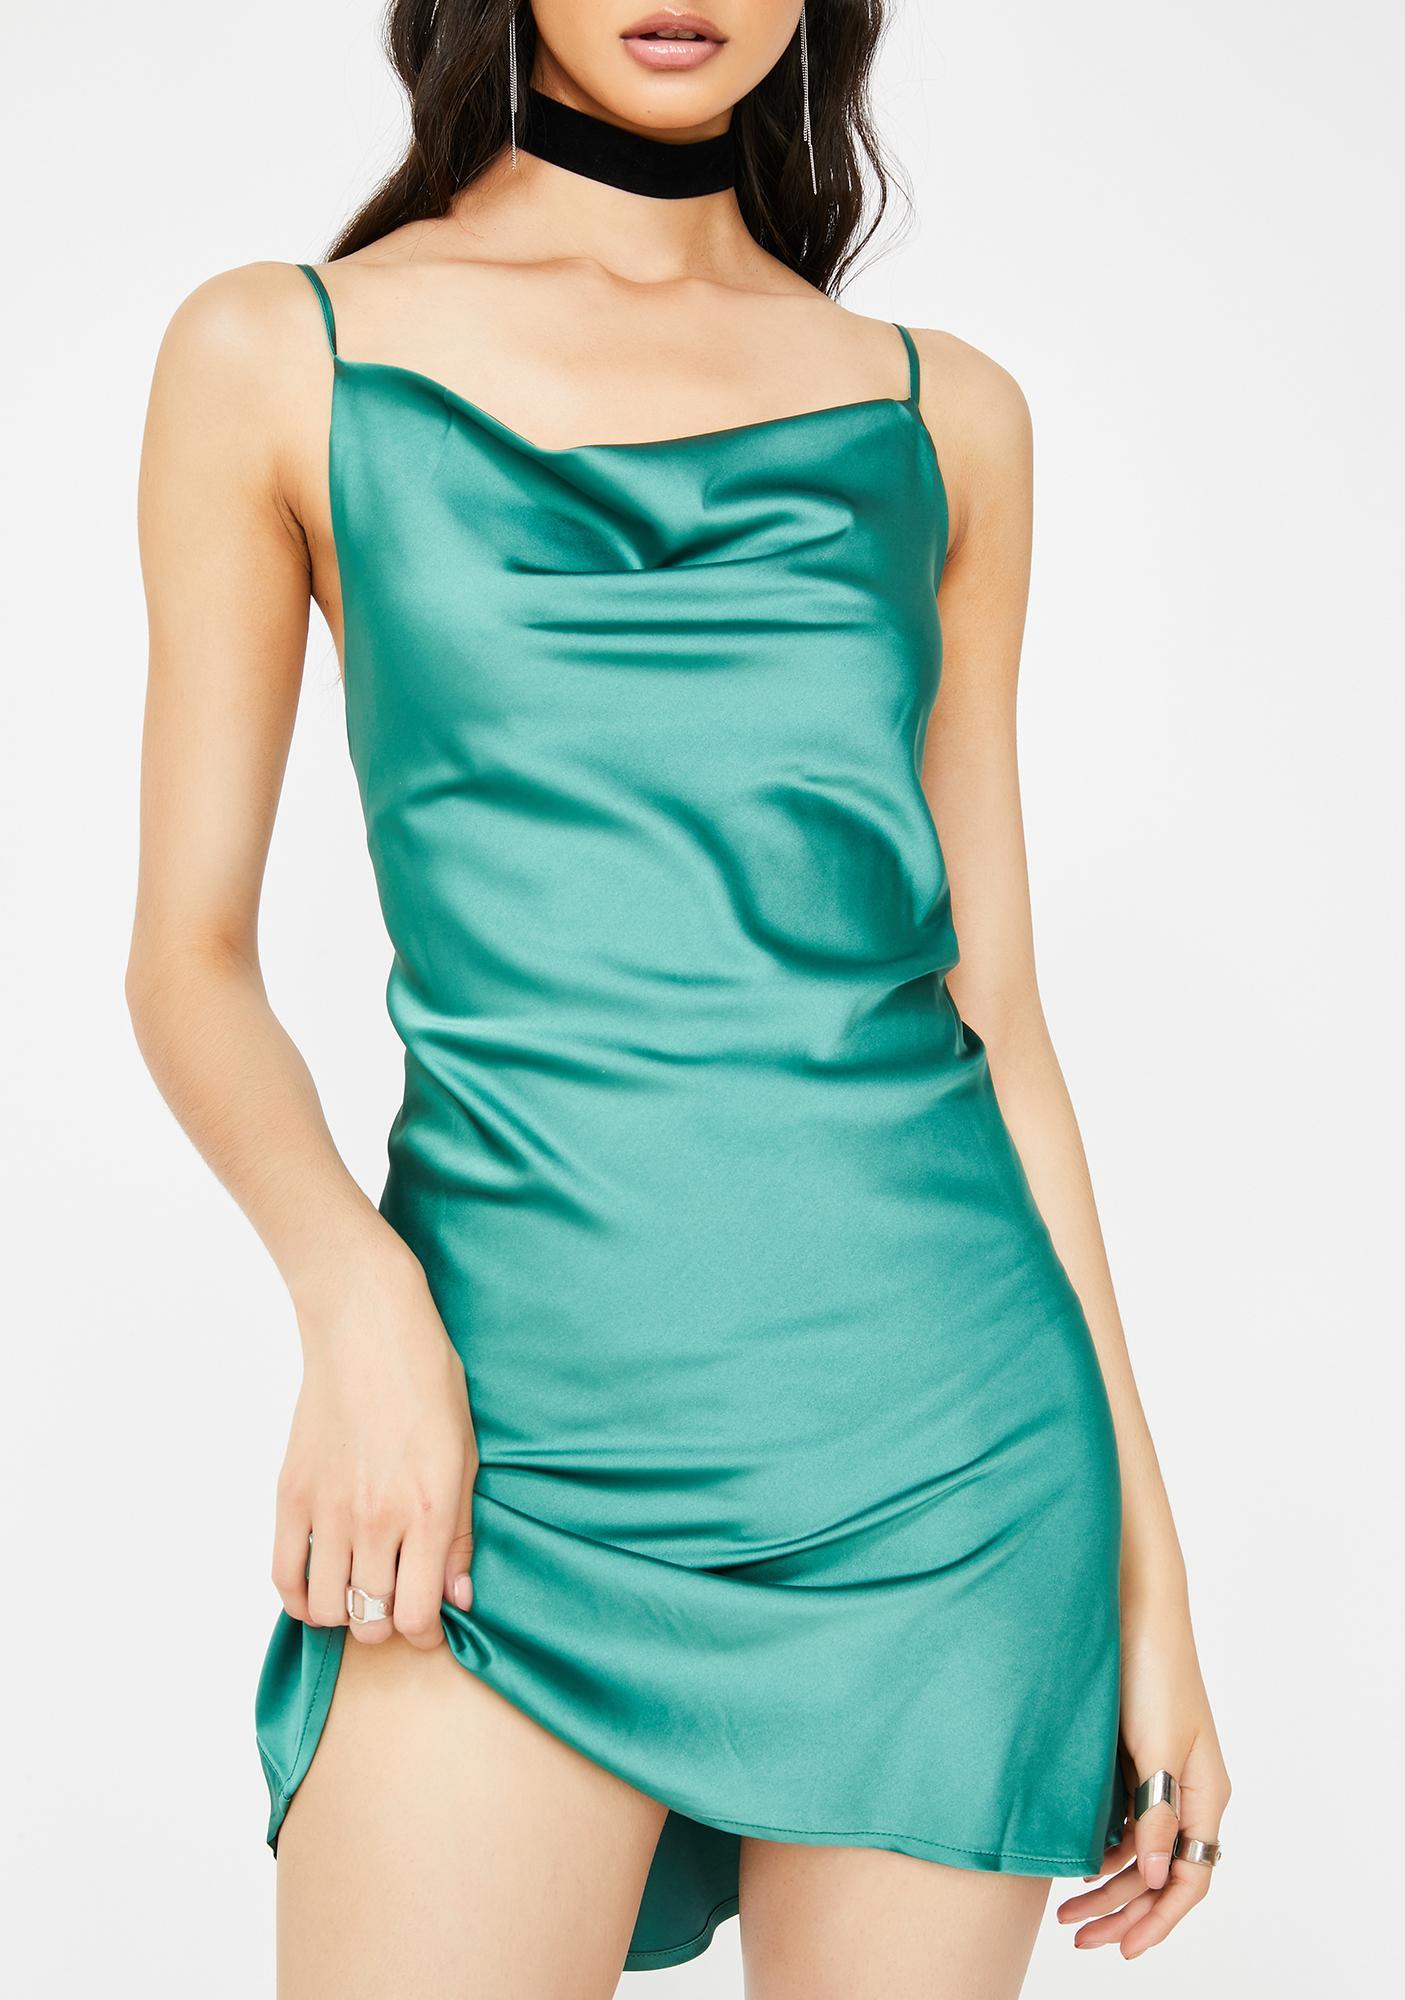 Cash High Class Sass Satin Dress